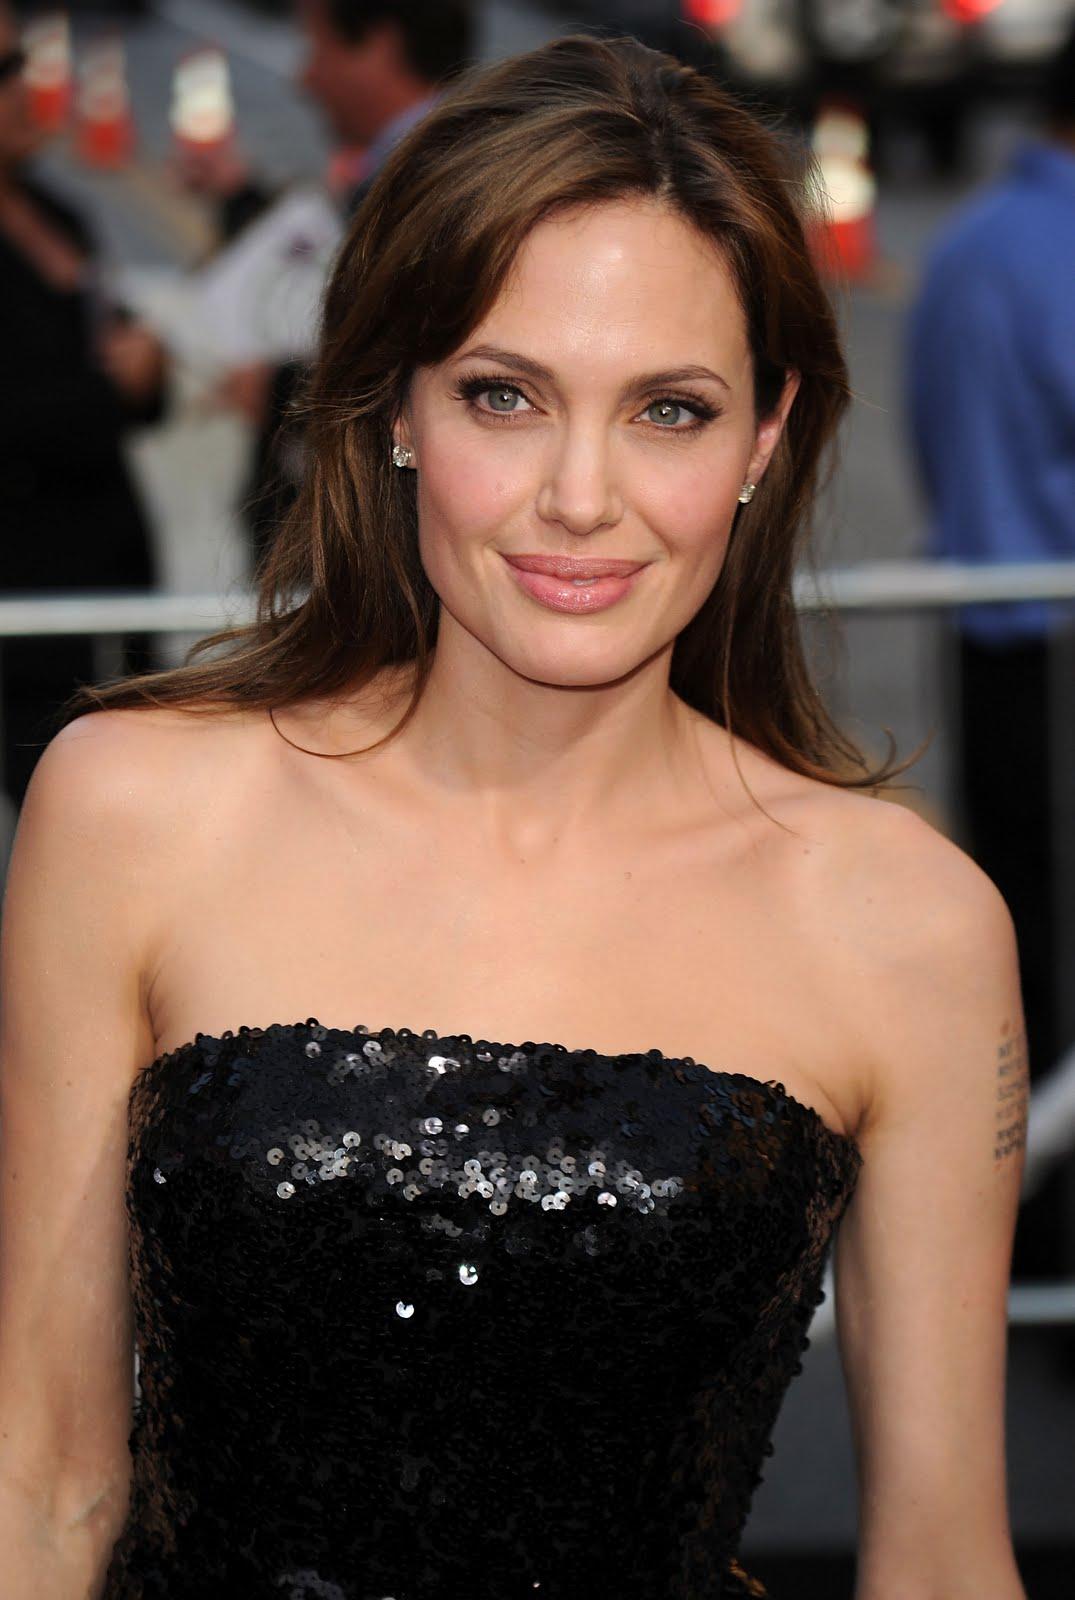 10 Most Attractive Female Celebrities in the USA  Wonderslist